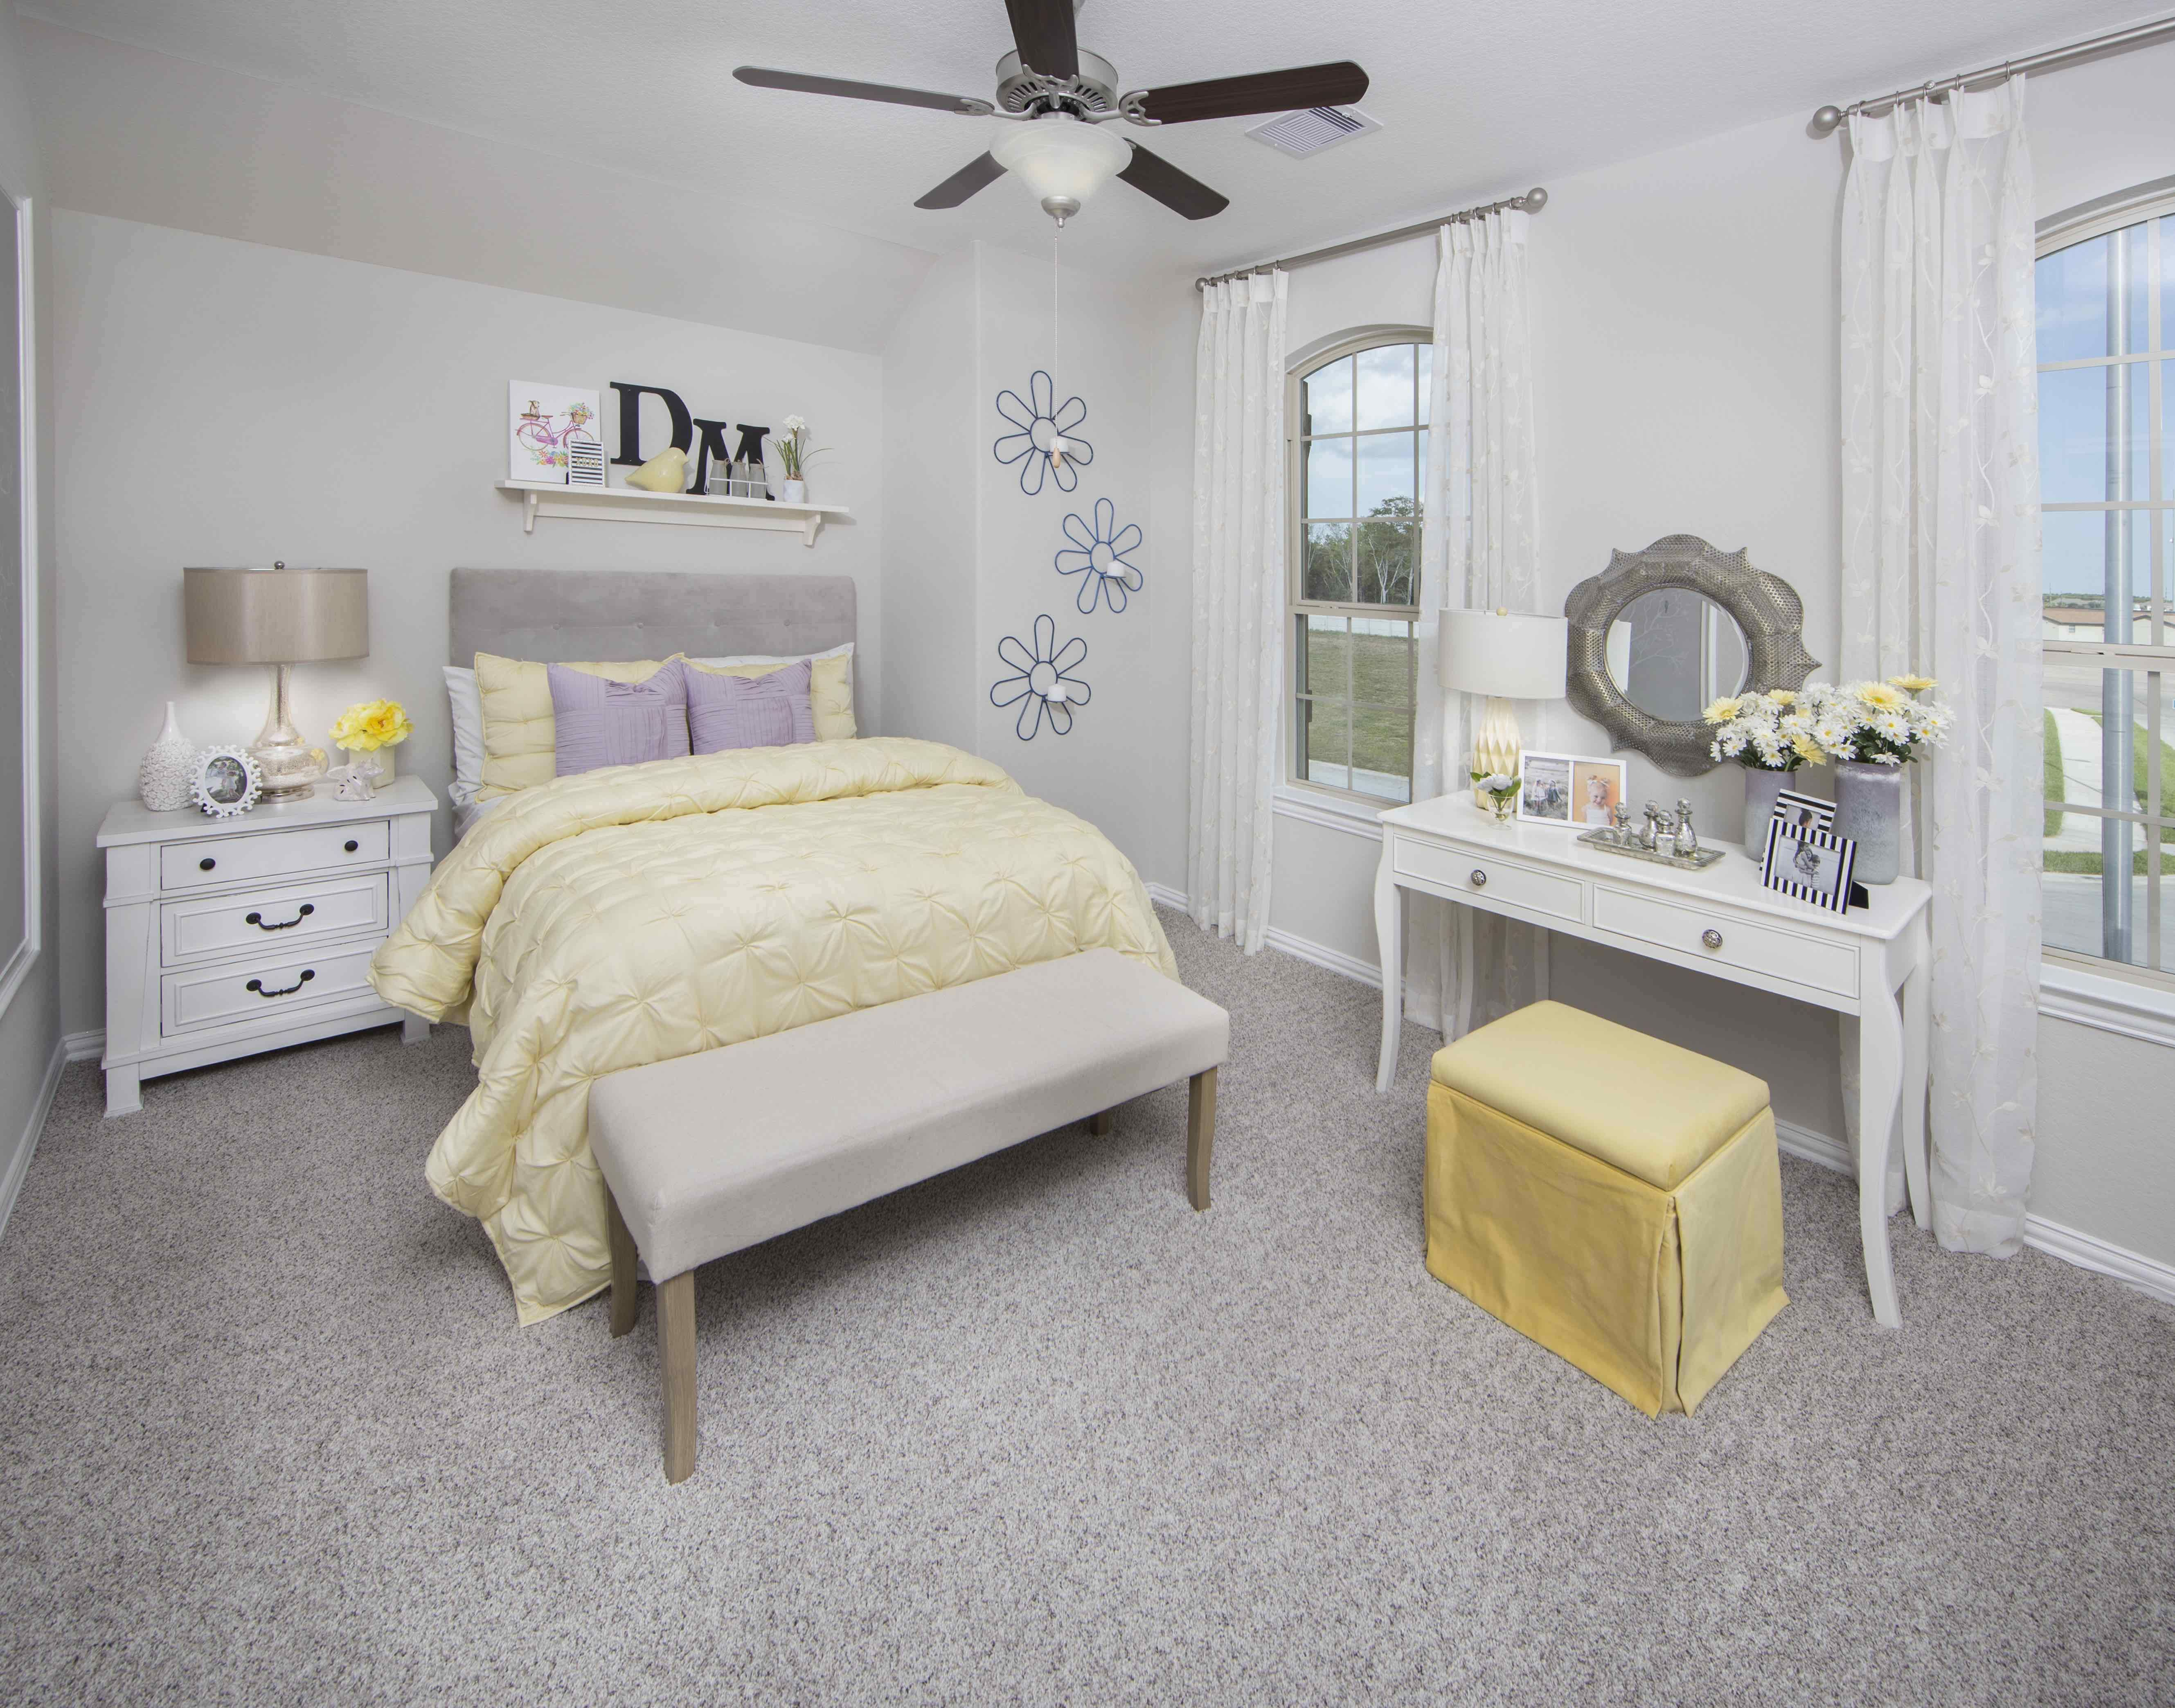 Lennar in 2020   New home communities, Home, Girl bedroom ... on New Model Bedroom Design  id=61254